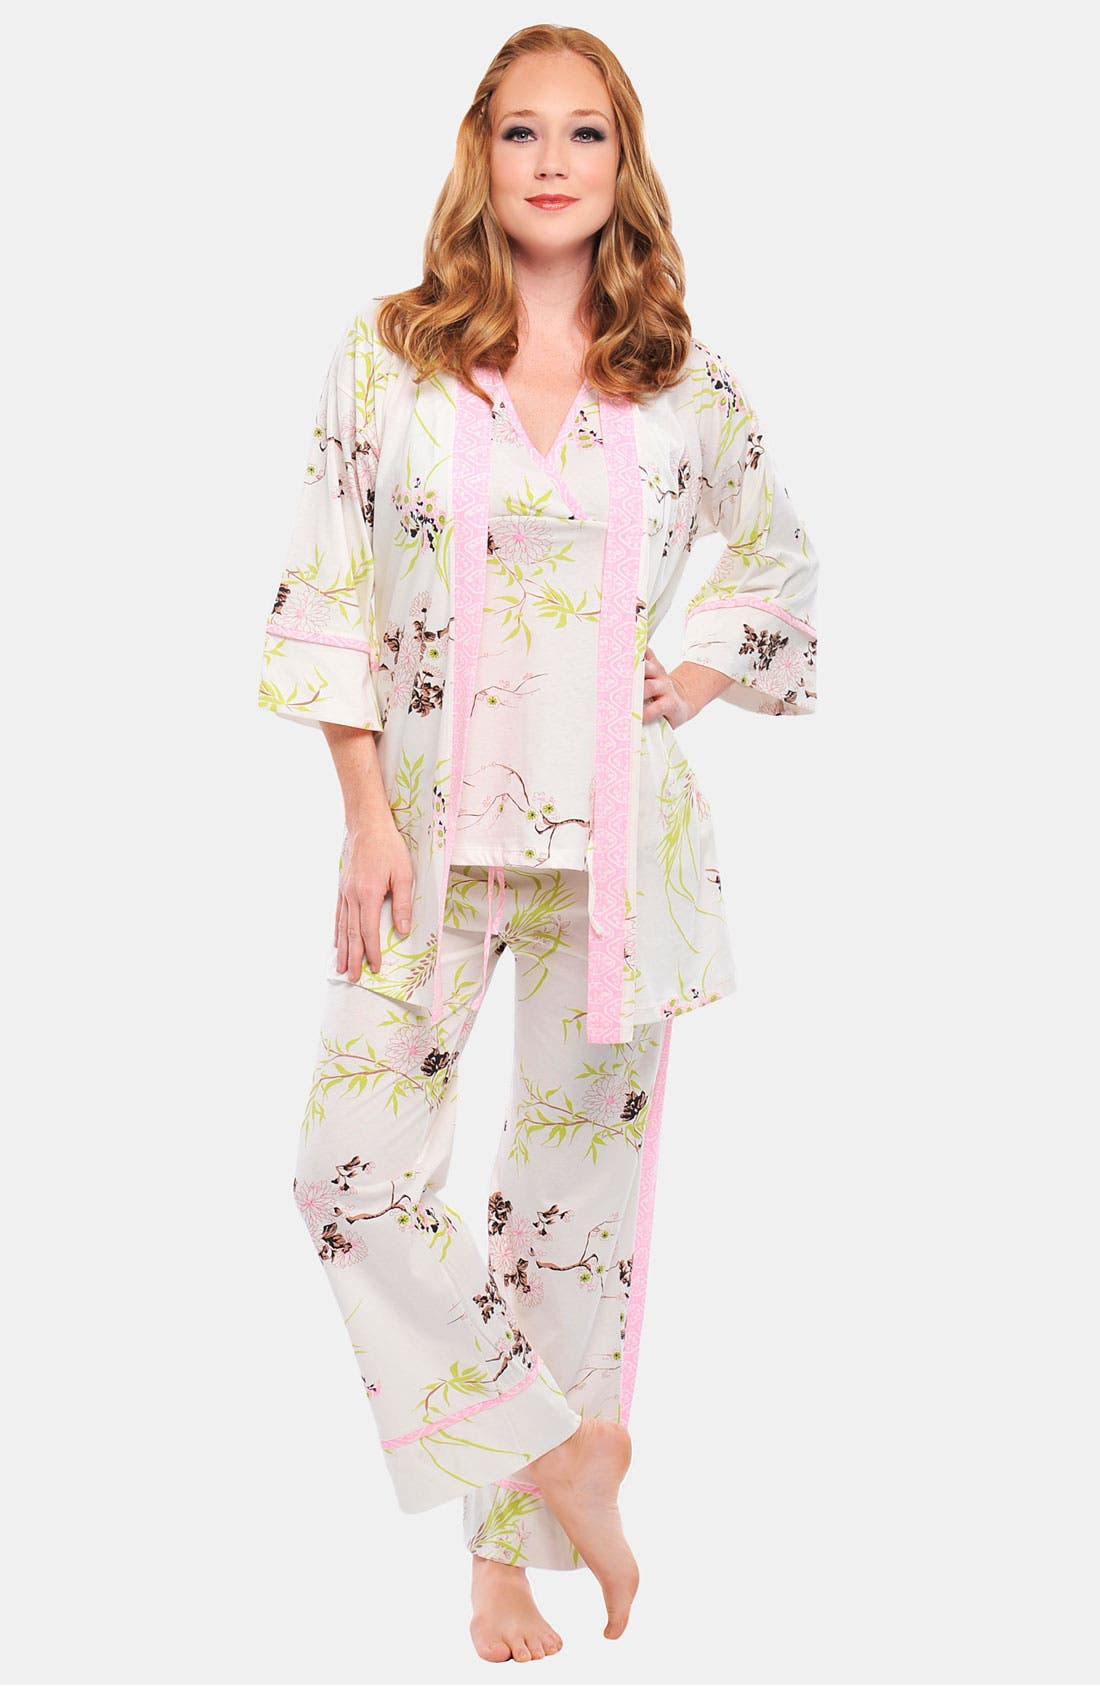 Alternate Image 1 Selected - Olian 'Anne' 4-Piece Maternity Sleepwear Gift Set